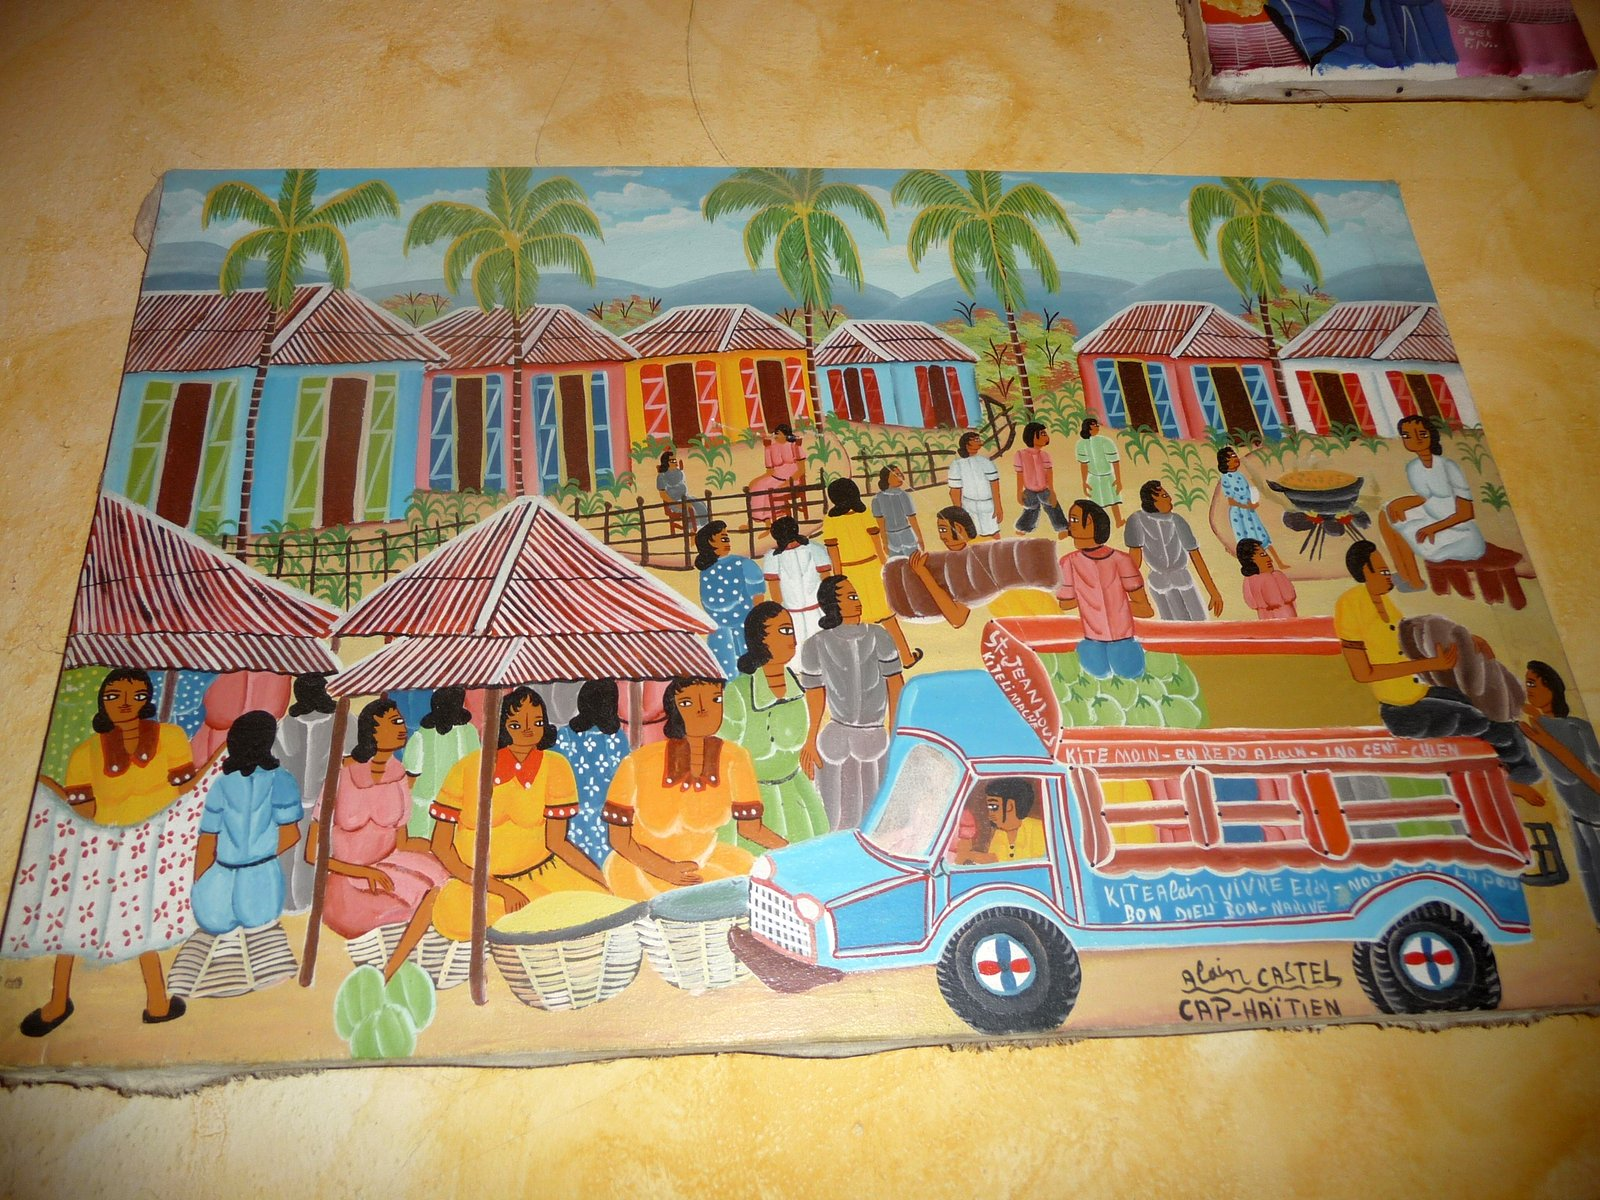 Babsblog Haitian Art And Mexican Folk Art For Sale Sale May 4 2013 San Miguel De Allende